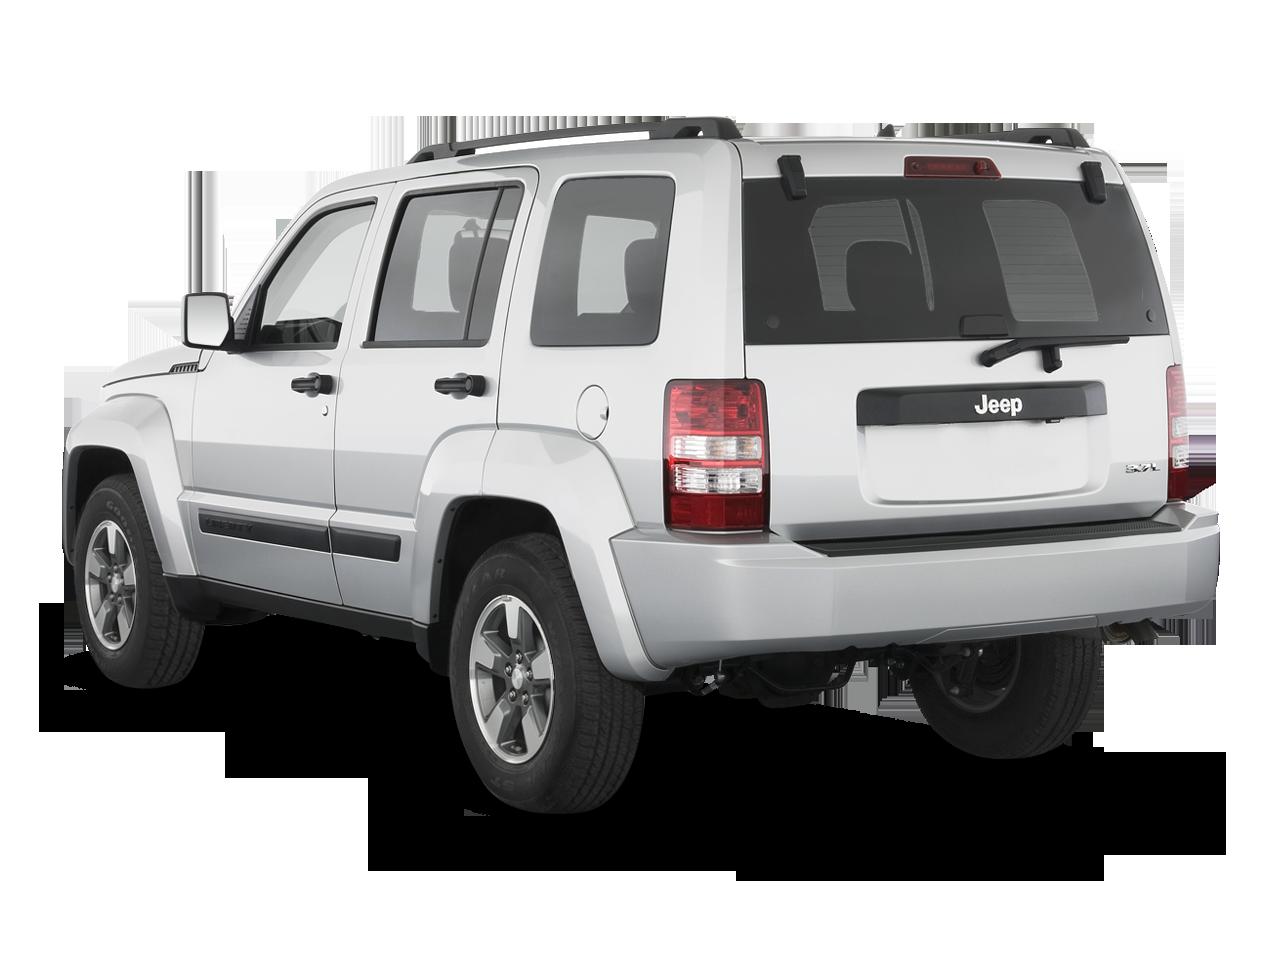 Liberty Auto Sales >> 2010 Jeep Liberty Renegade - Editor's Notebook - Automobile Magazine